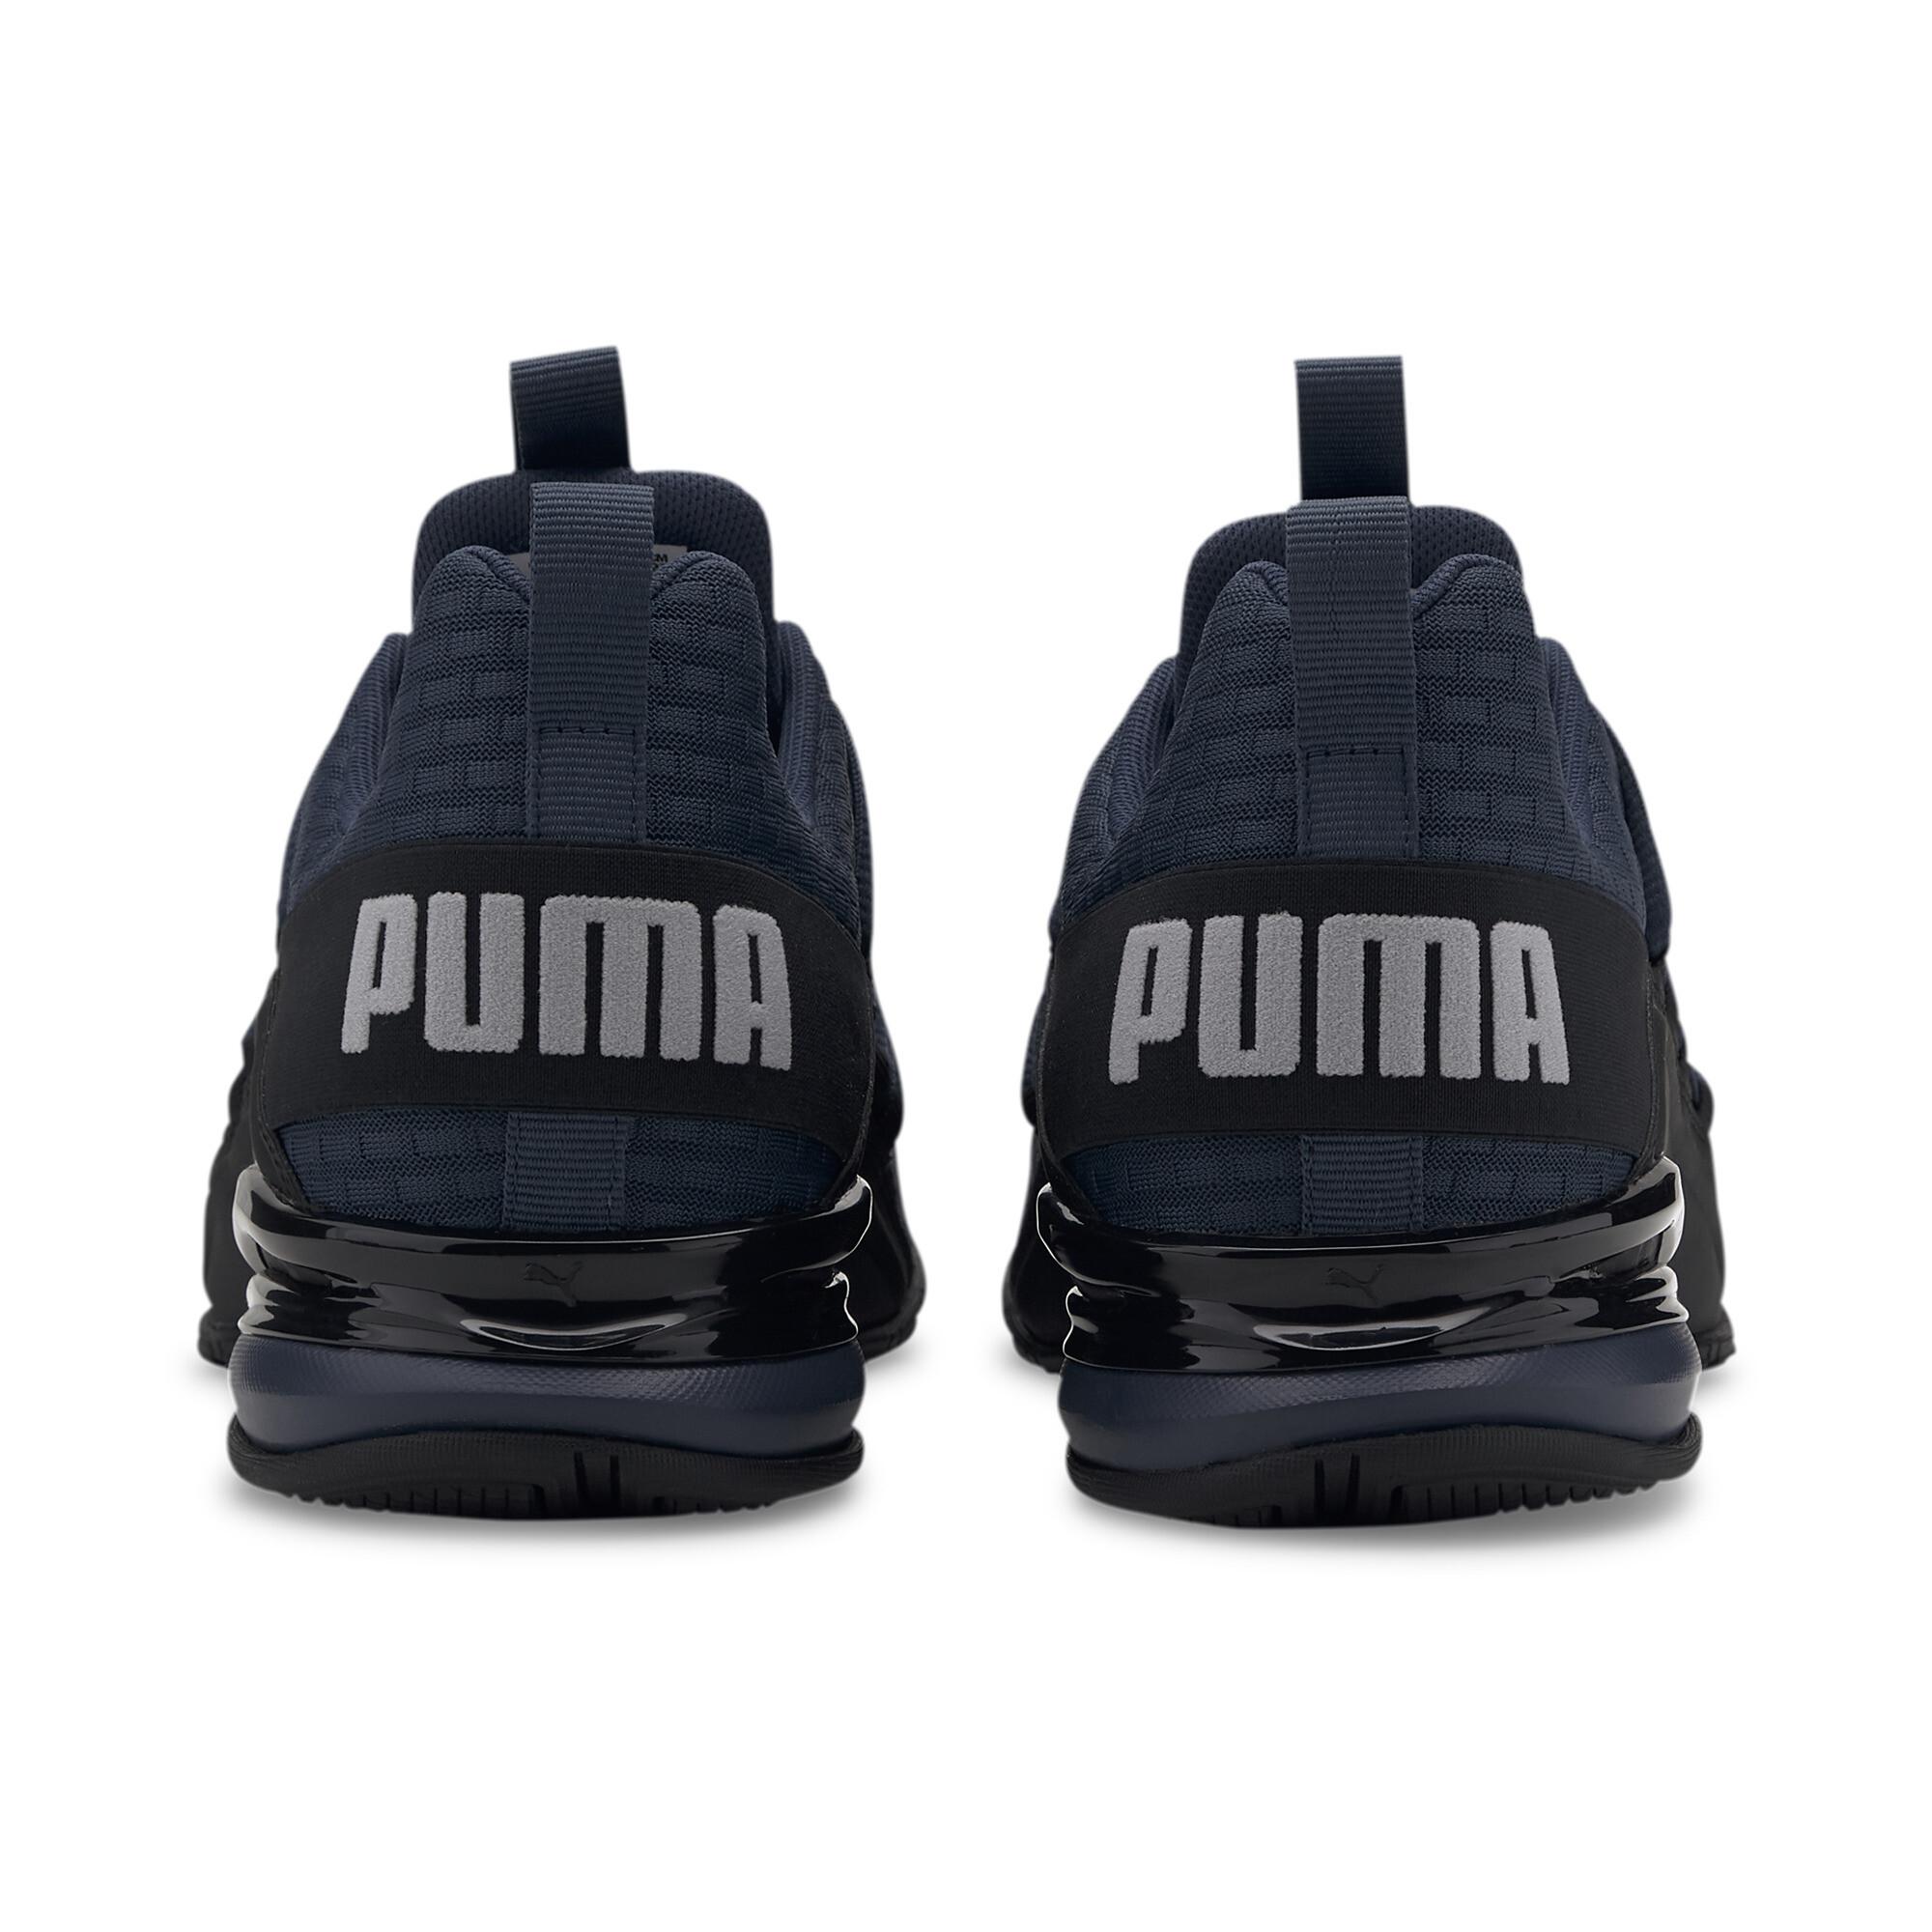 PUMA-Men-039-s-Axelion-Block-Running-Shoes thumbnail 3